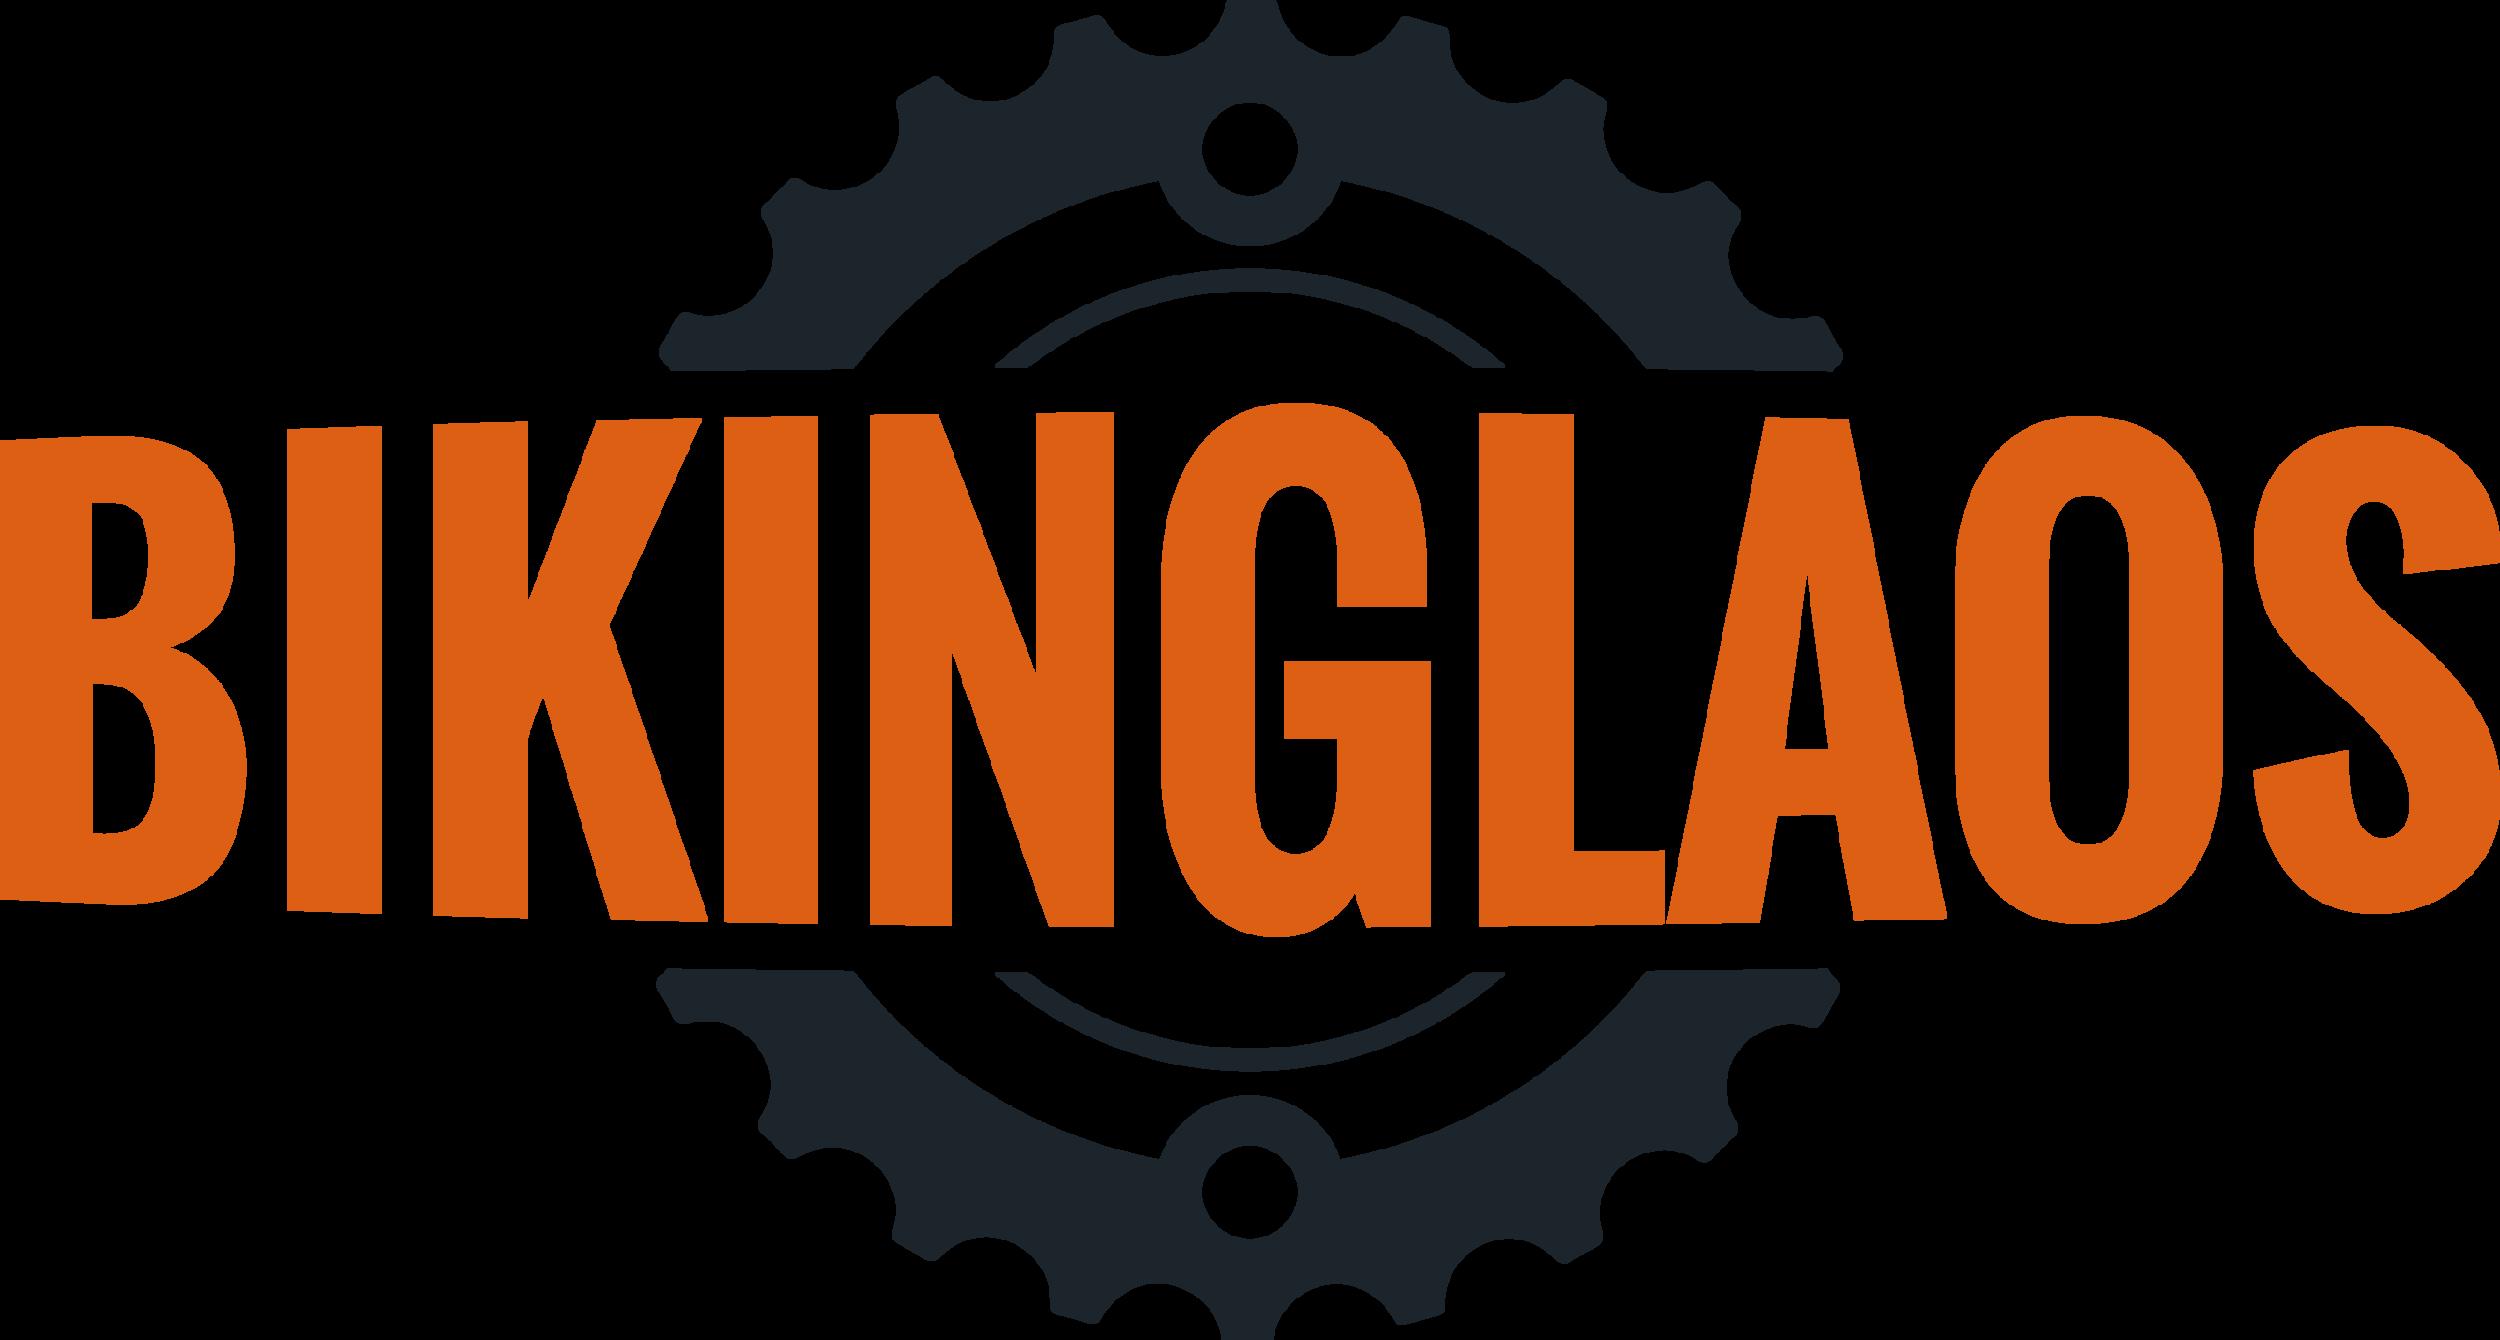 Biking-Laos-Cycling-Tours-Logo